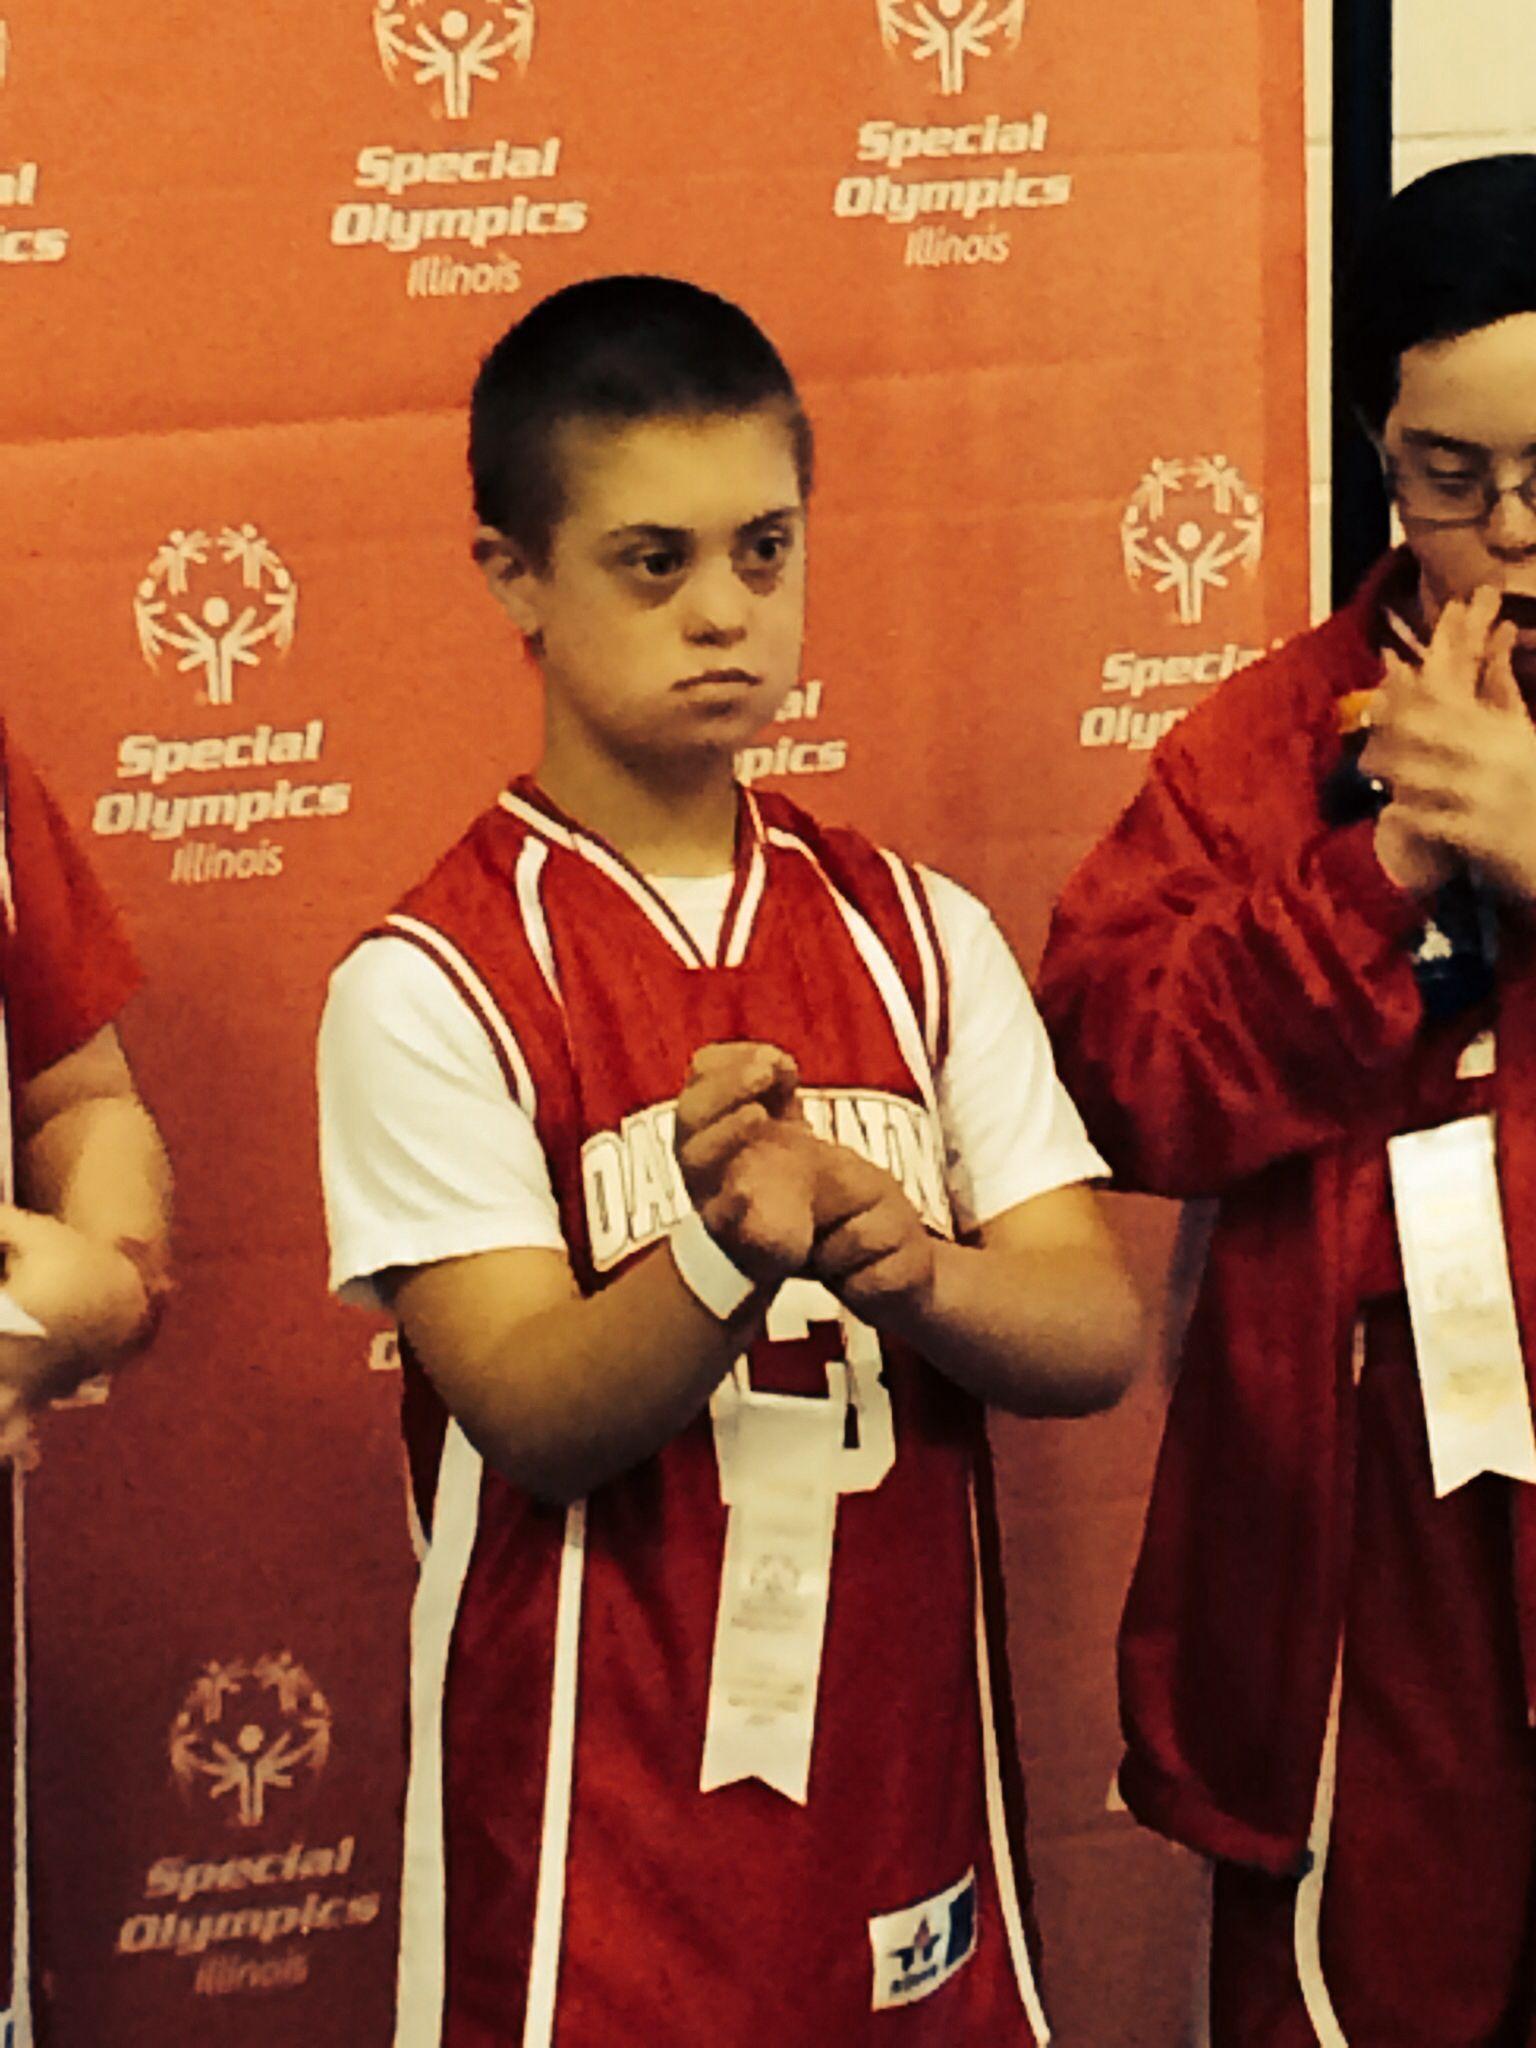 Special Olympics! Celebrate!